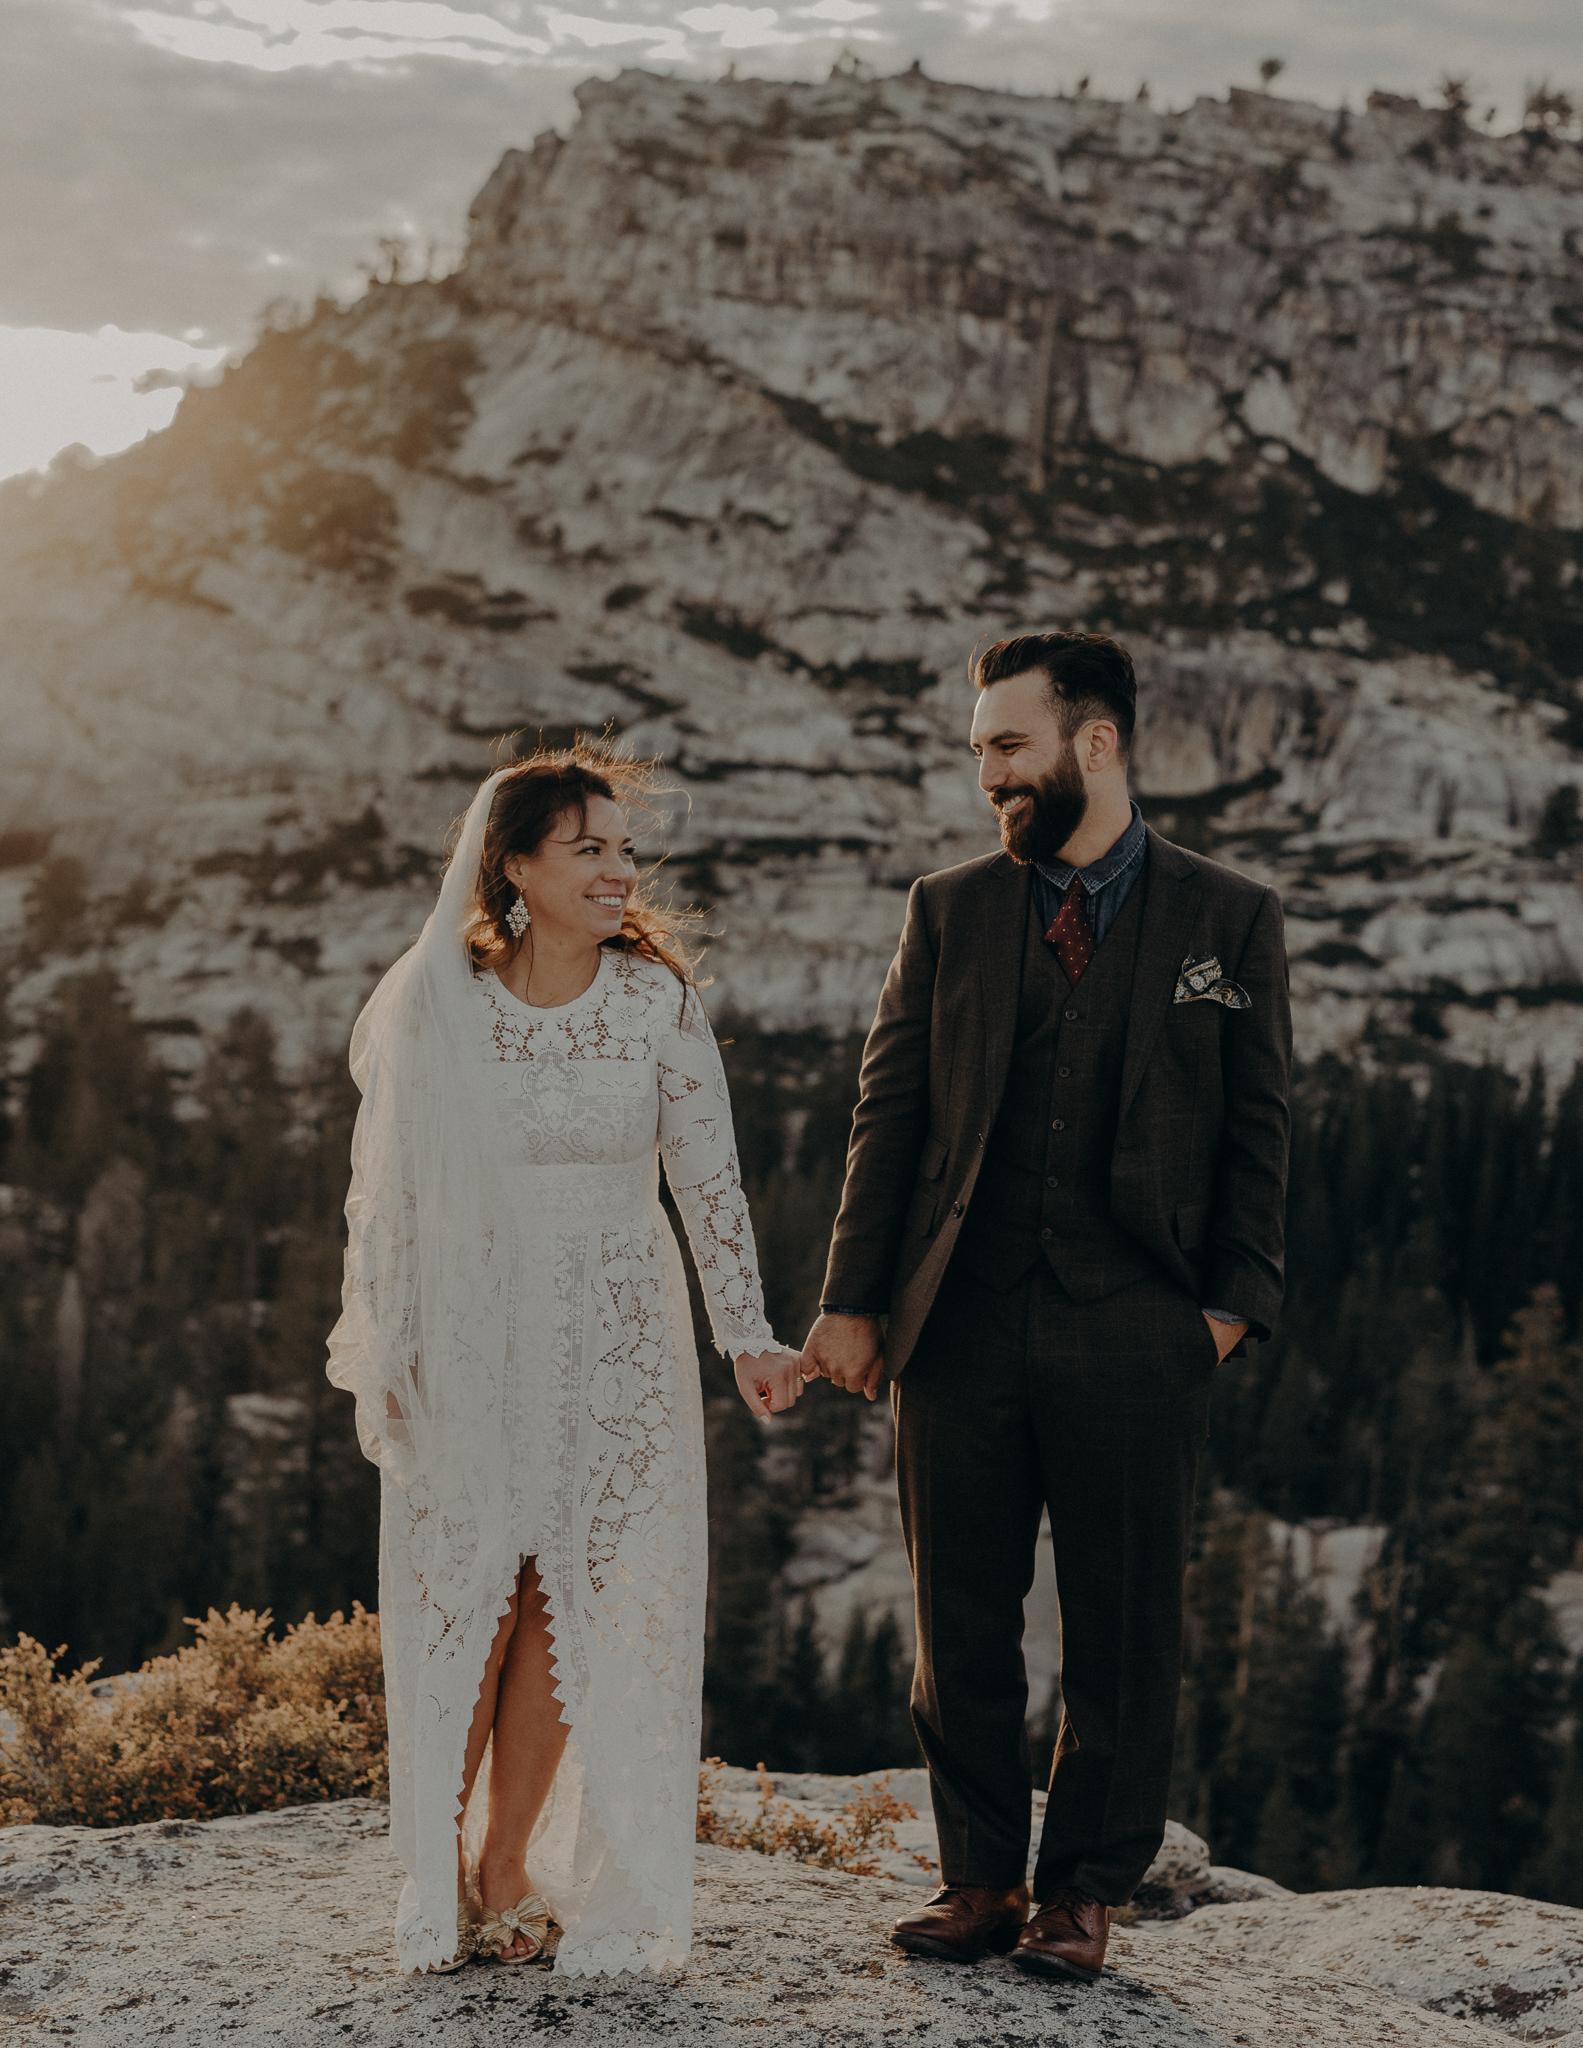 Yosemite Elopement Photographer - Evergreen Lodge Wedding Photographer - IsaiahAndTaylor.com-045.jpg